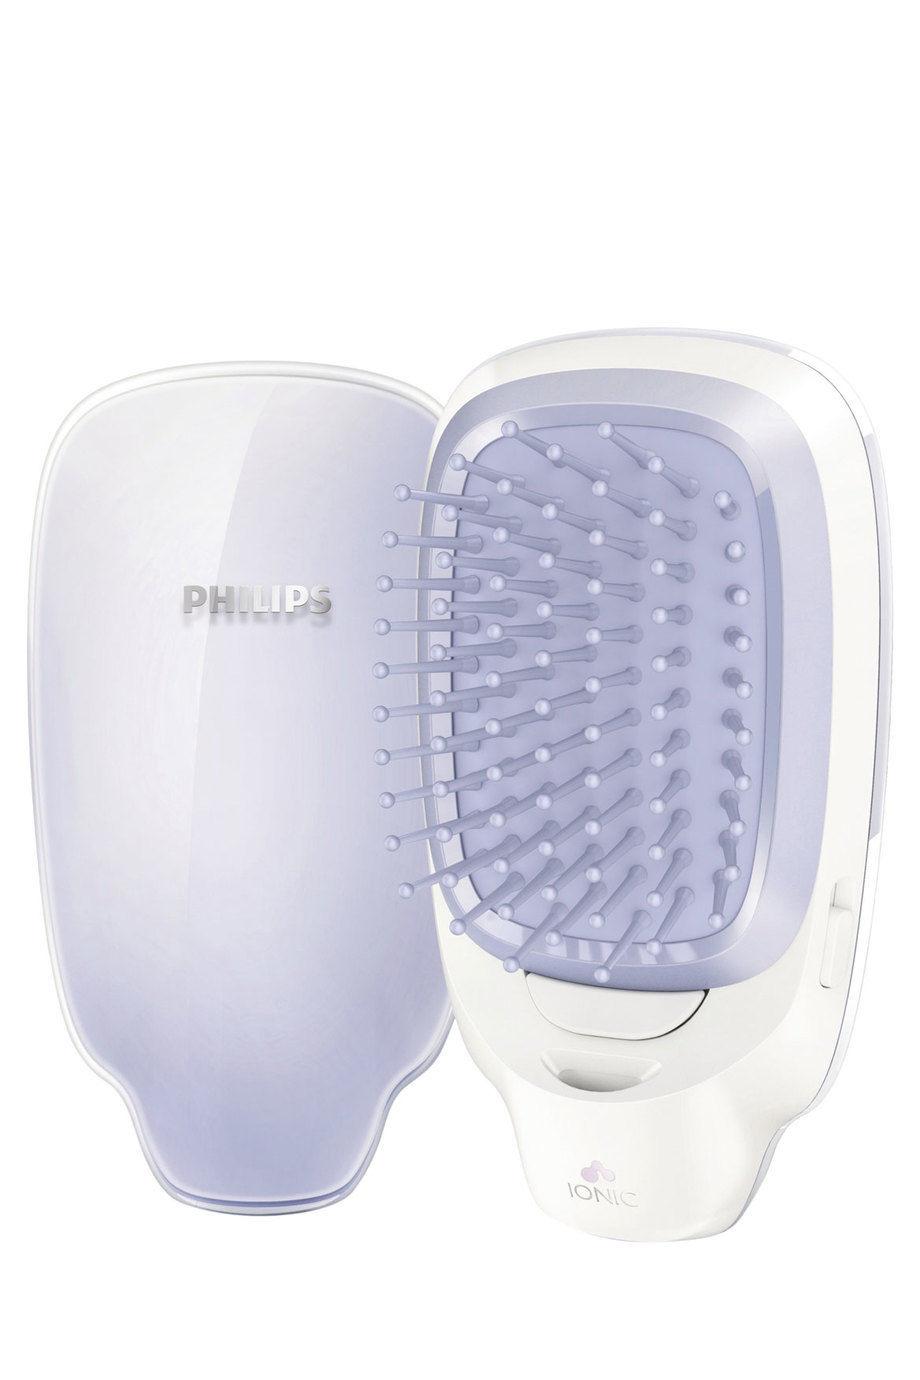 Philips HP4585/00 离子造型梳 $33.95!